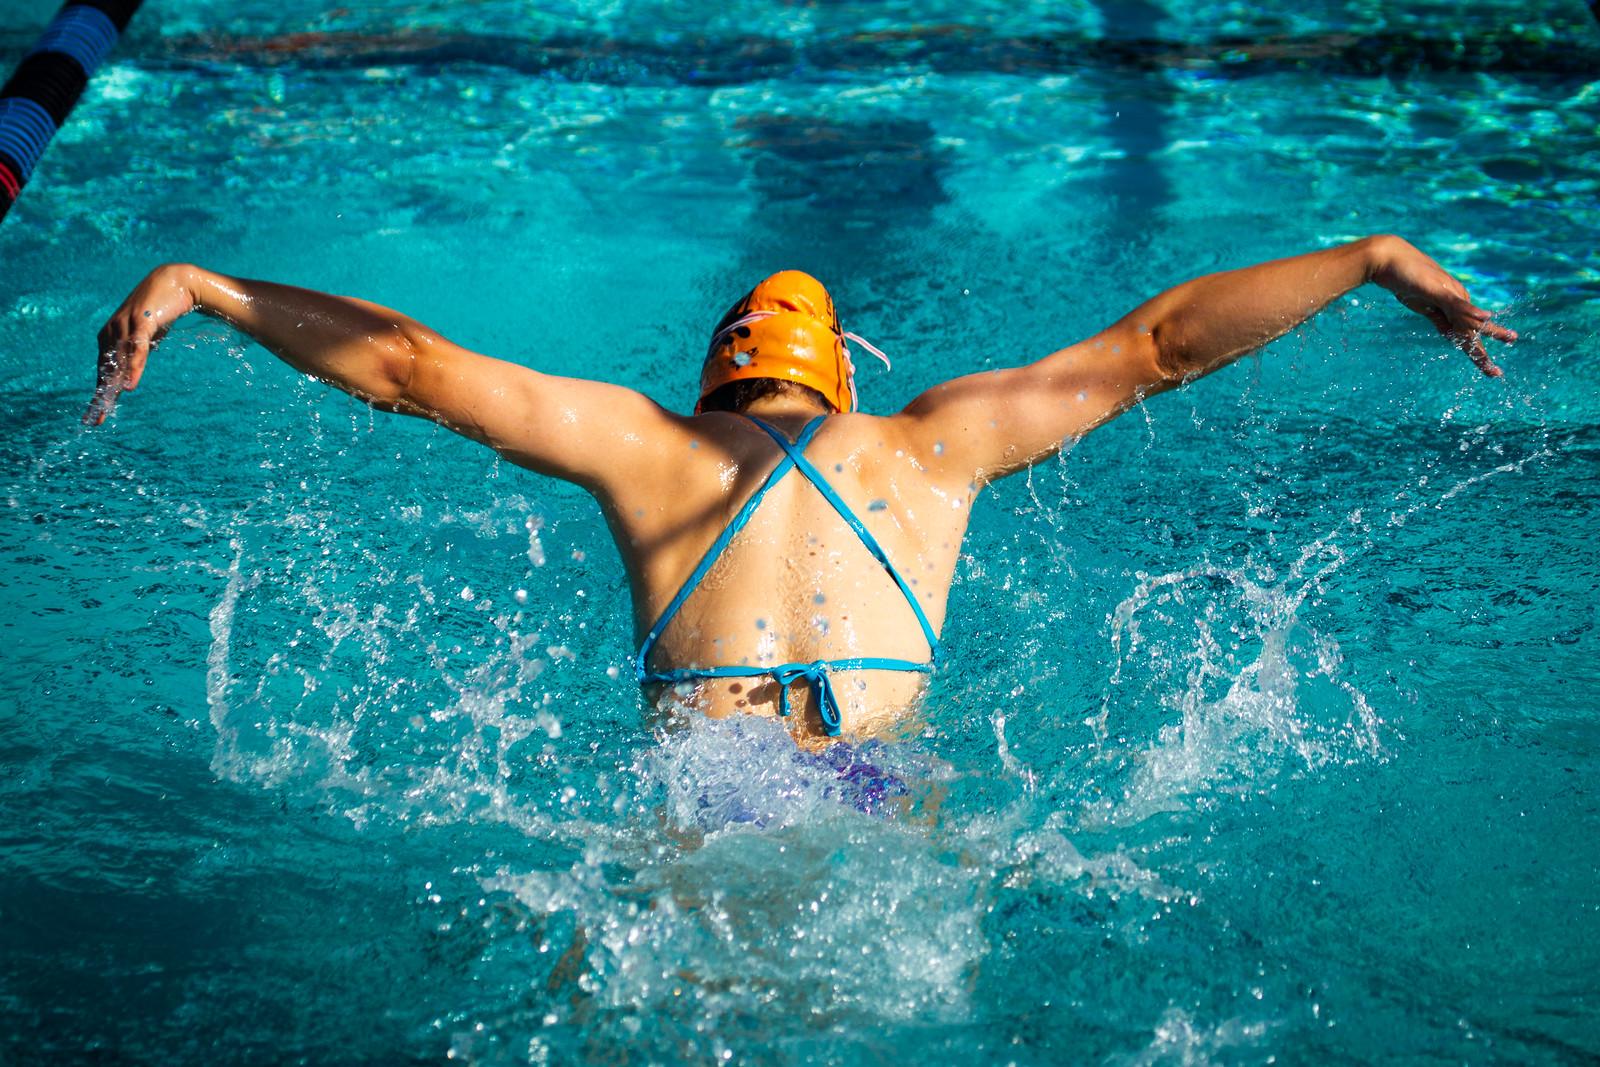 IMAGE: https://photos.smugmug.com/Sports/Swimming/Seals-Photos-2019/Deithloff-Avery/i-dd4zF7P/1/2cbf9744/X3/A73X9829-X3.jpg